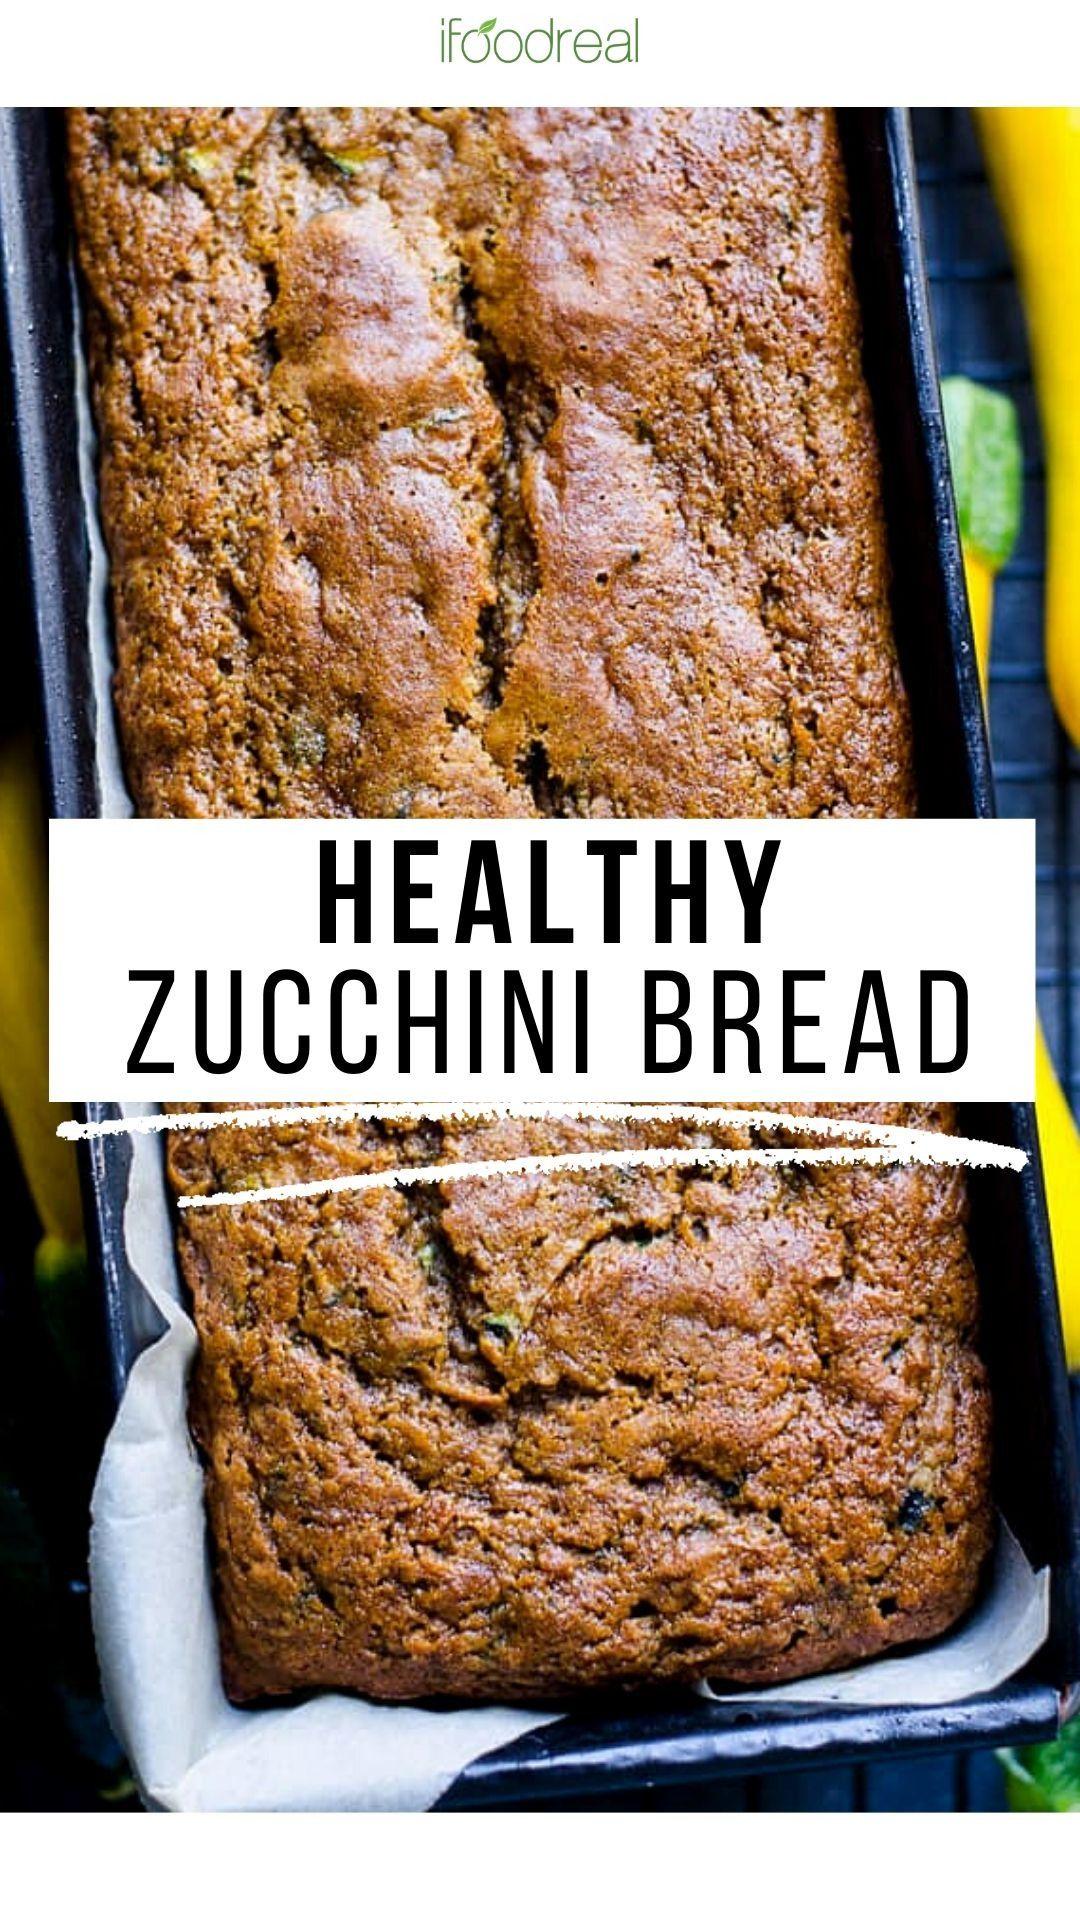 The Best Zucchini Bread In 2020 Zucchini Bread Healthy Zucchini Bread Recipes Healthy Dessert Recipes